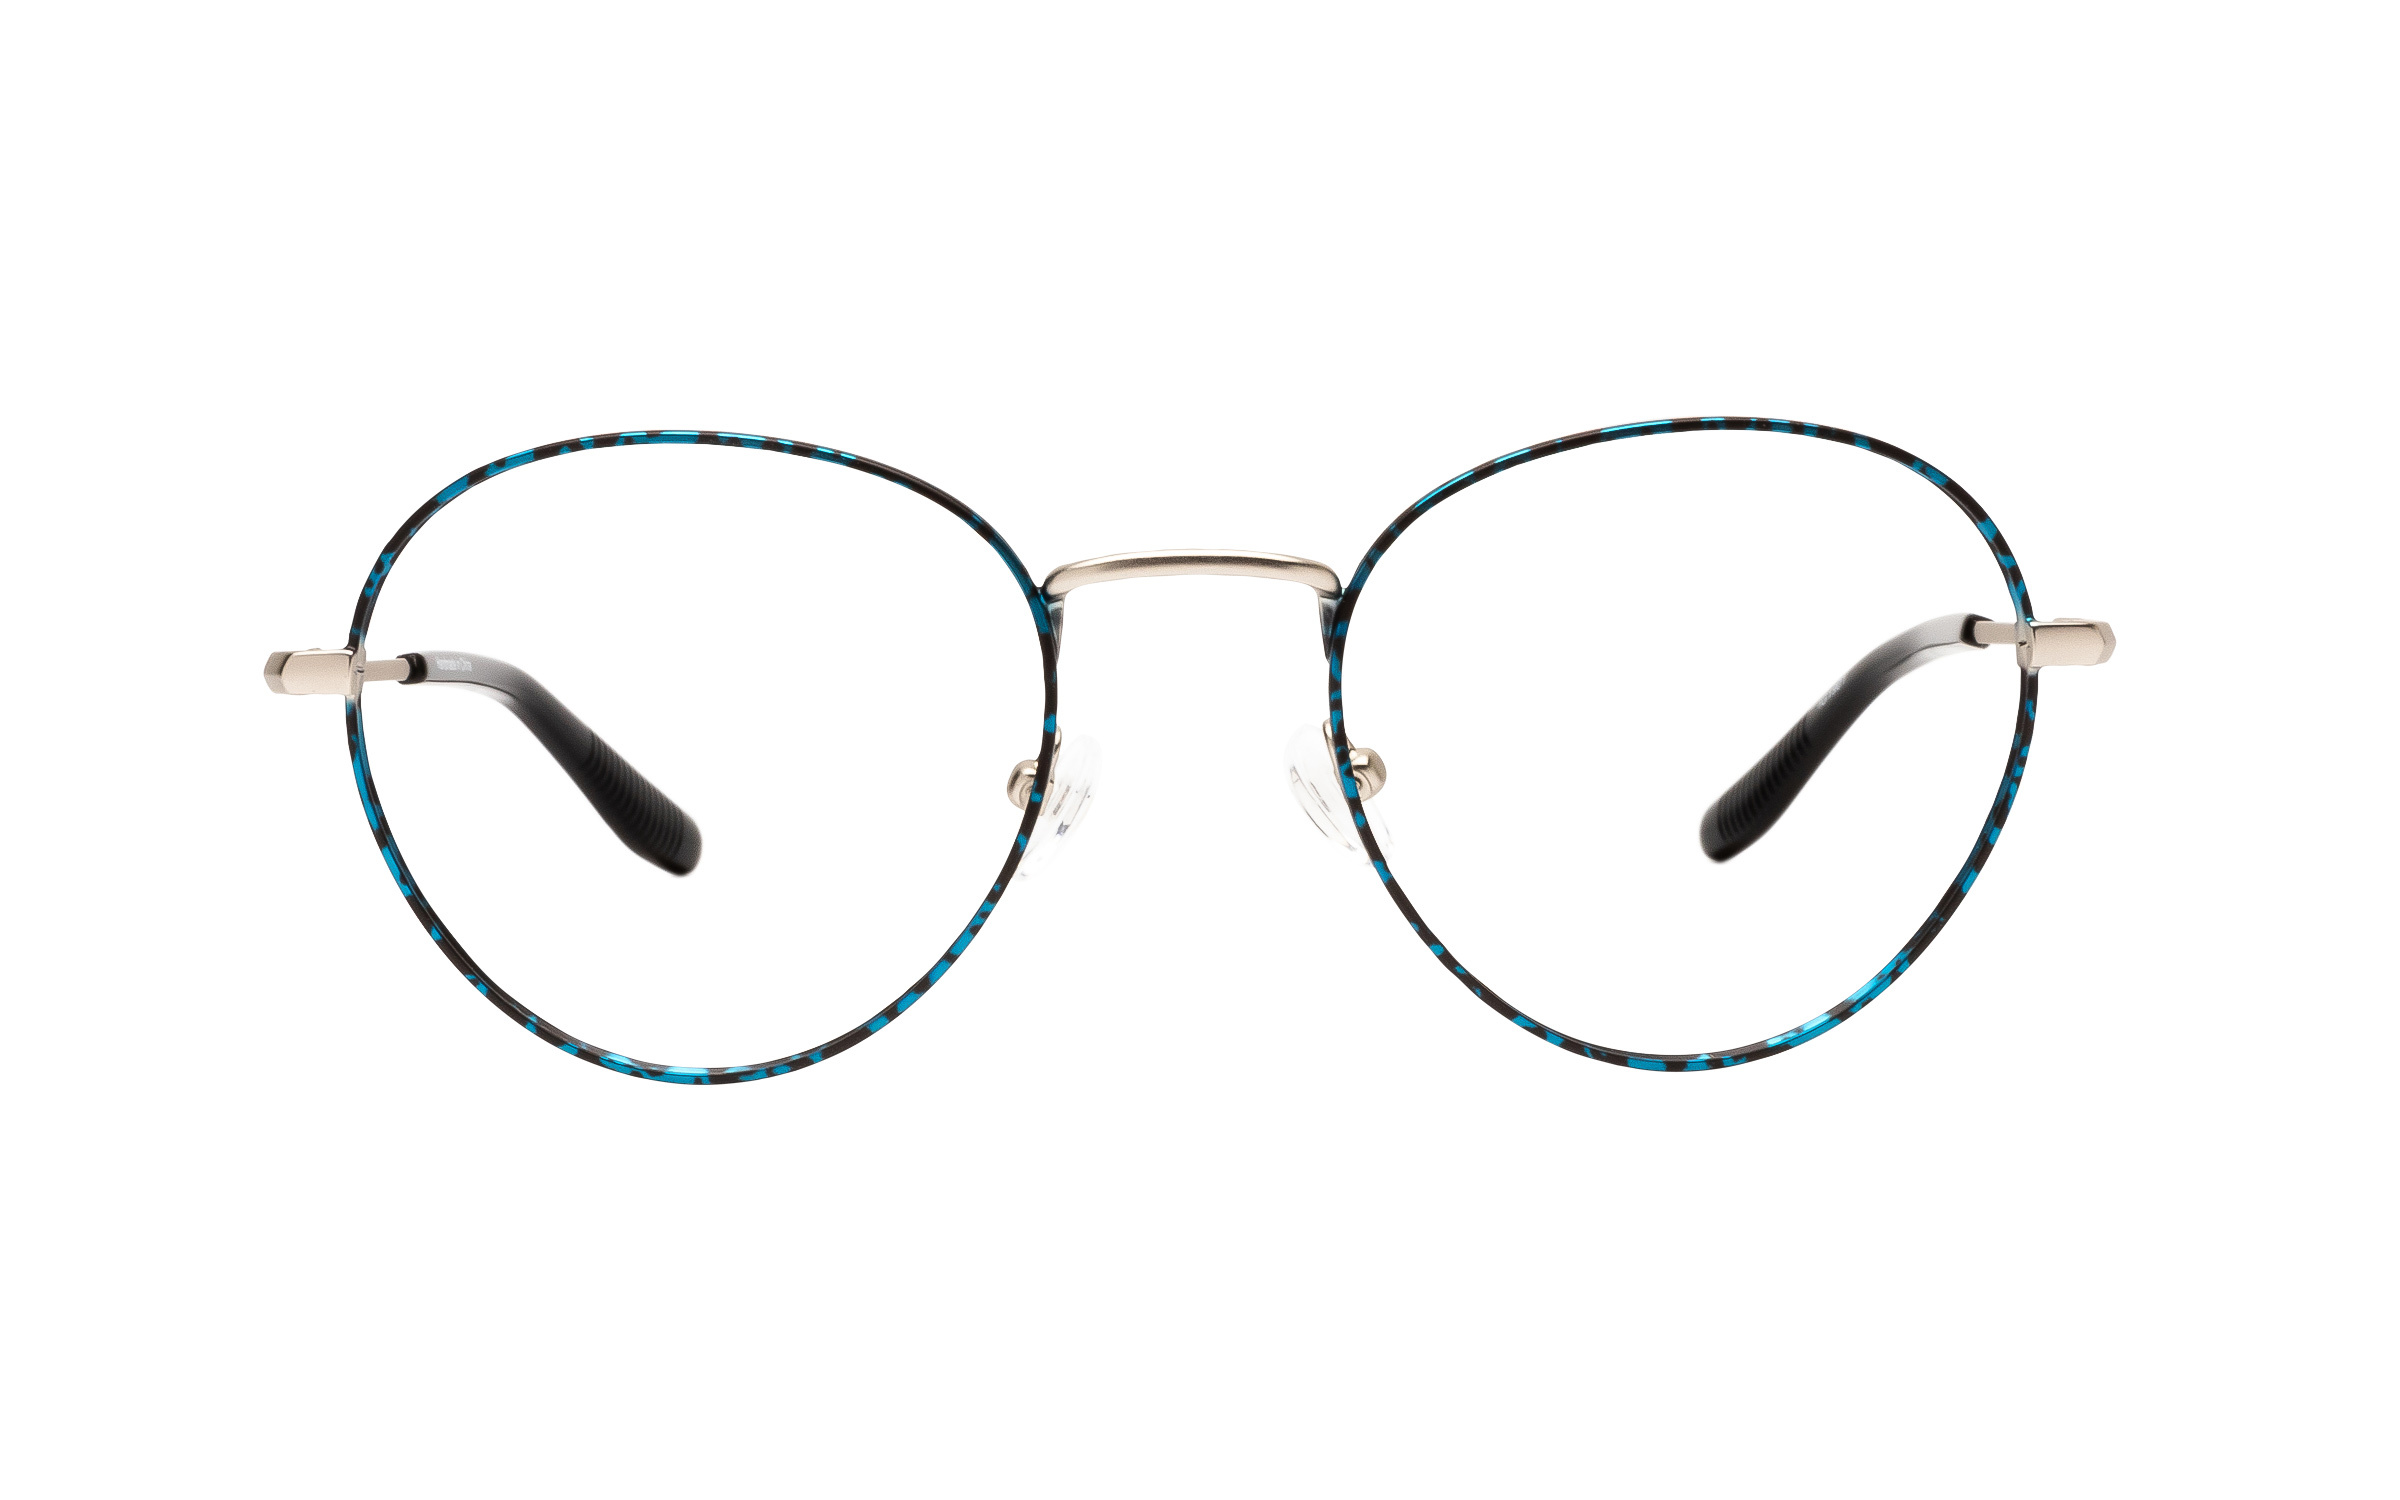 Joseph Marc Richards (50) Eyeglasses and Frame in Blue Havana Tortoise/Blue | Acetate/Metal